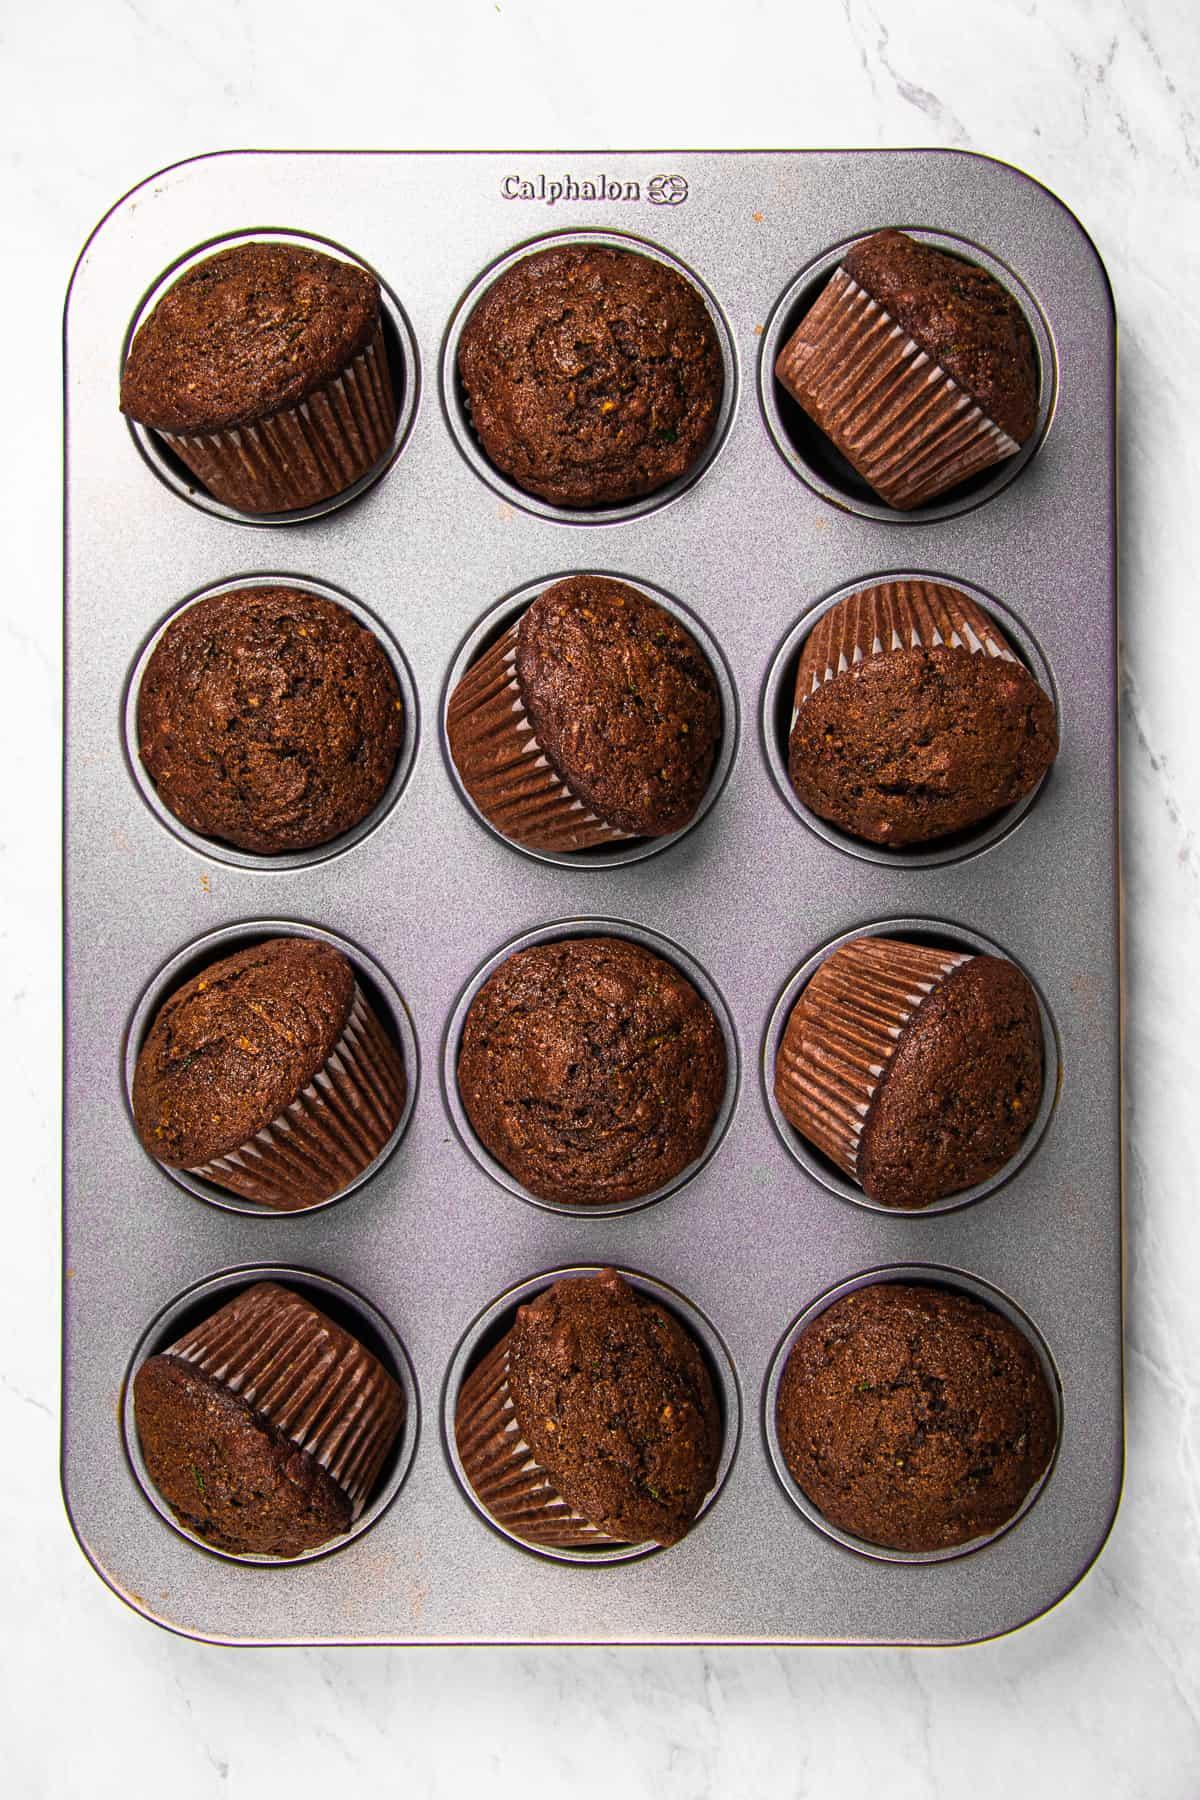 Chocolate Zucchini Muffins in a baking pan.